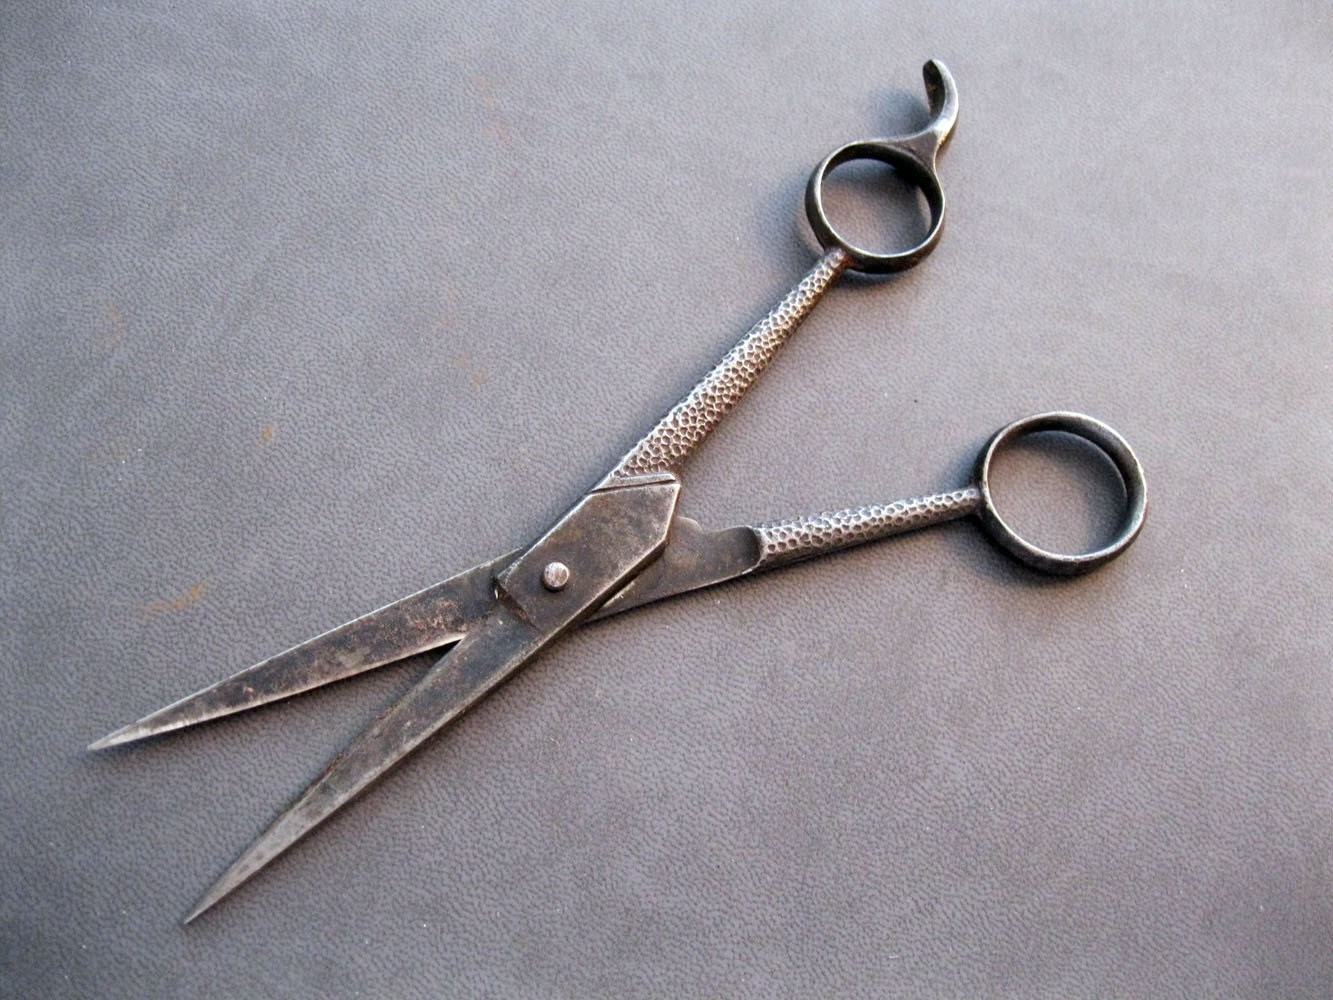 vintage hair scissors ornate textured Sweeney Todd old